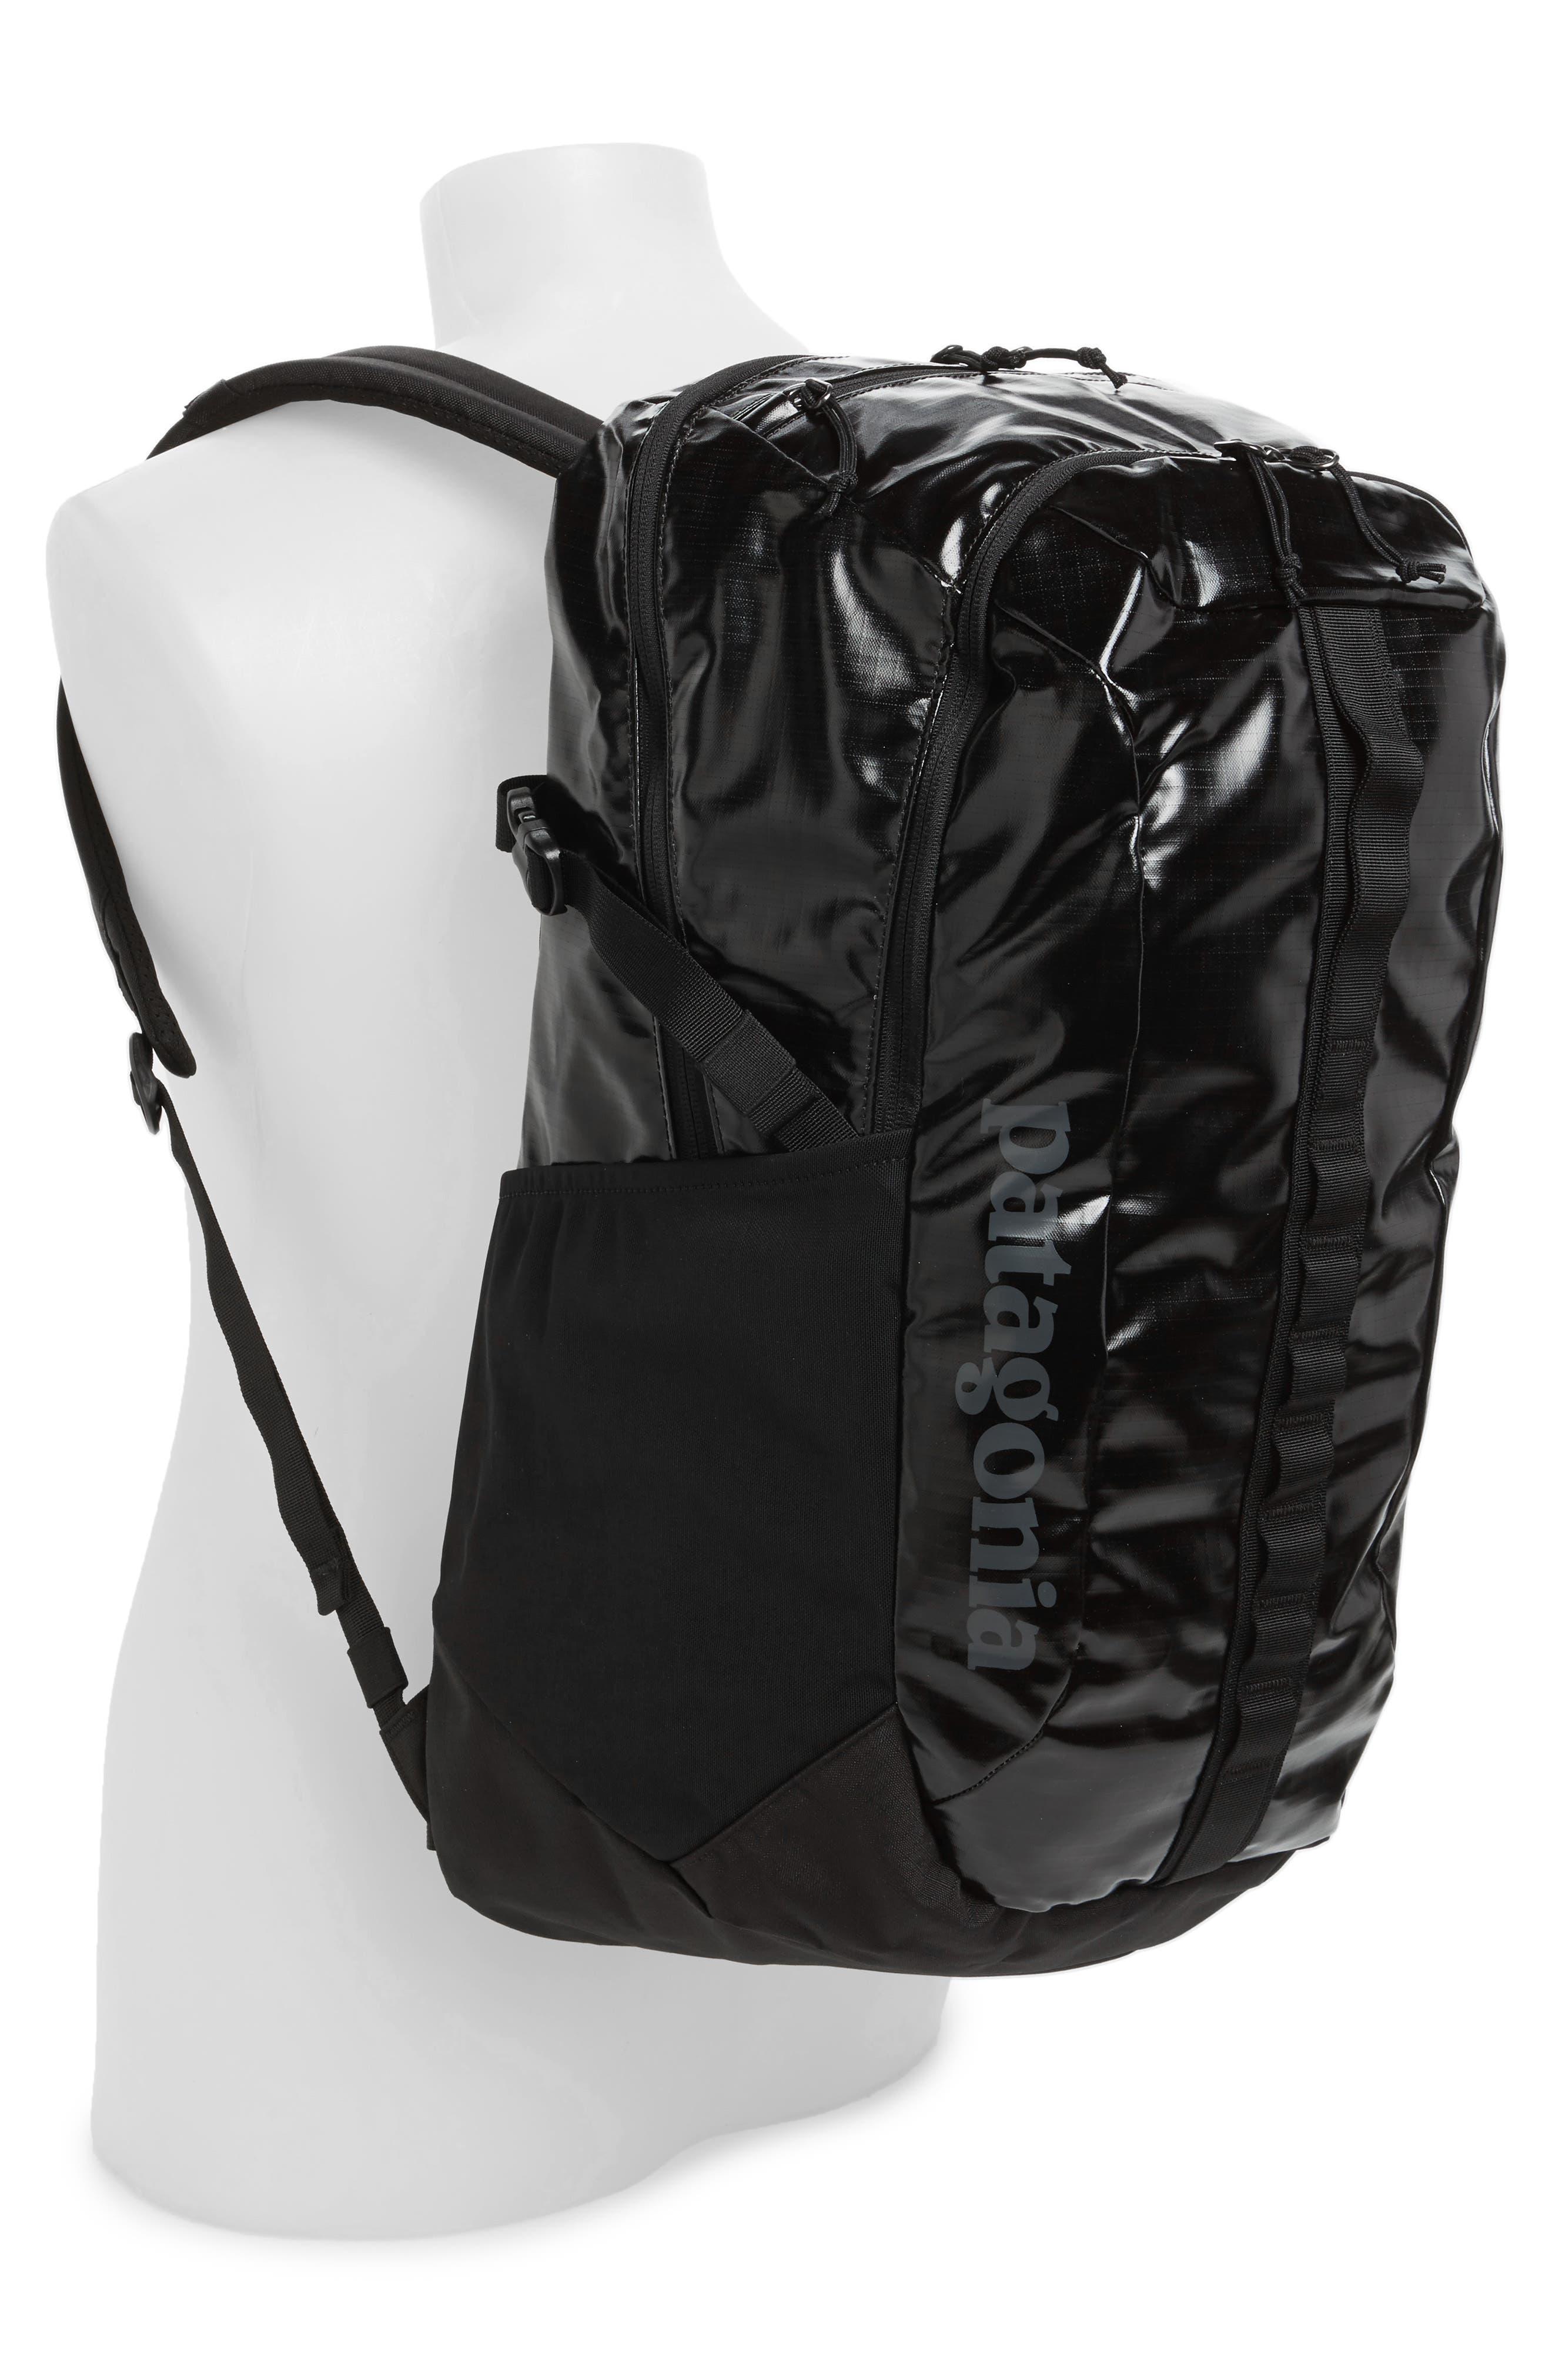 PATAGONIA,                             Black Hole 30-Liter Backpack,                             Alternate thumbnail 2, color,                             001